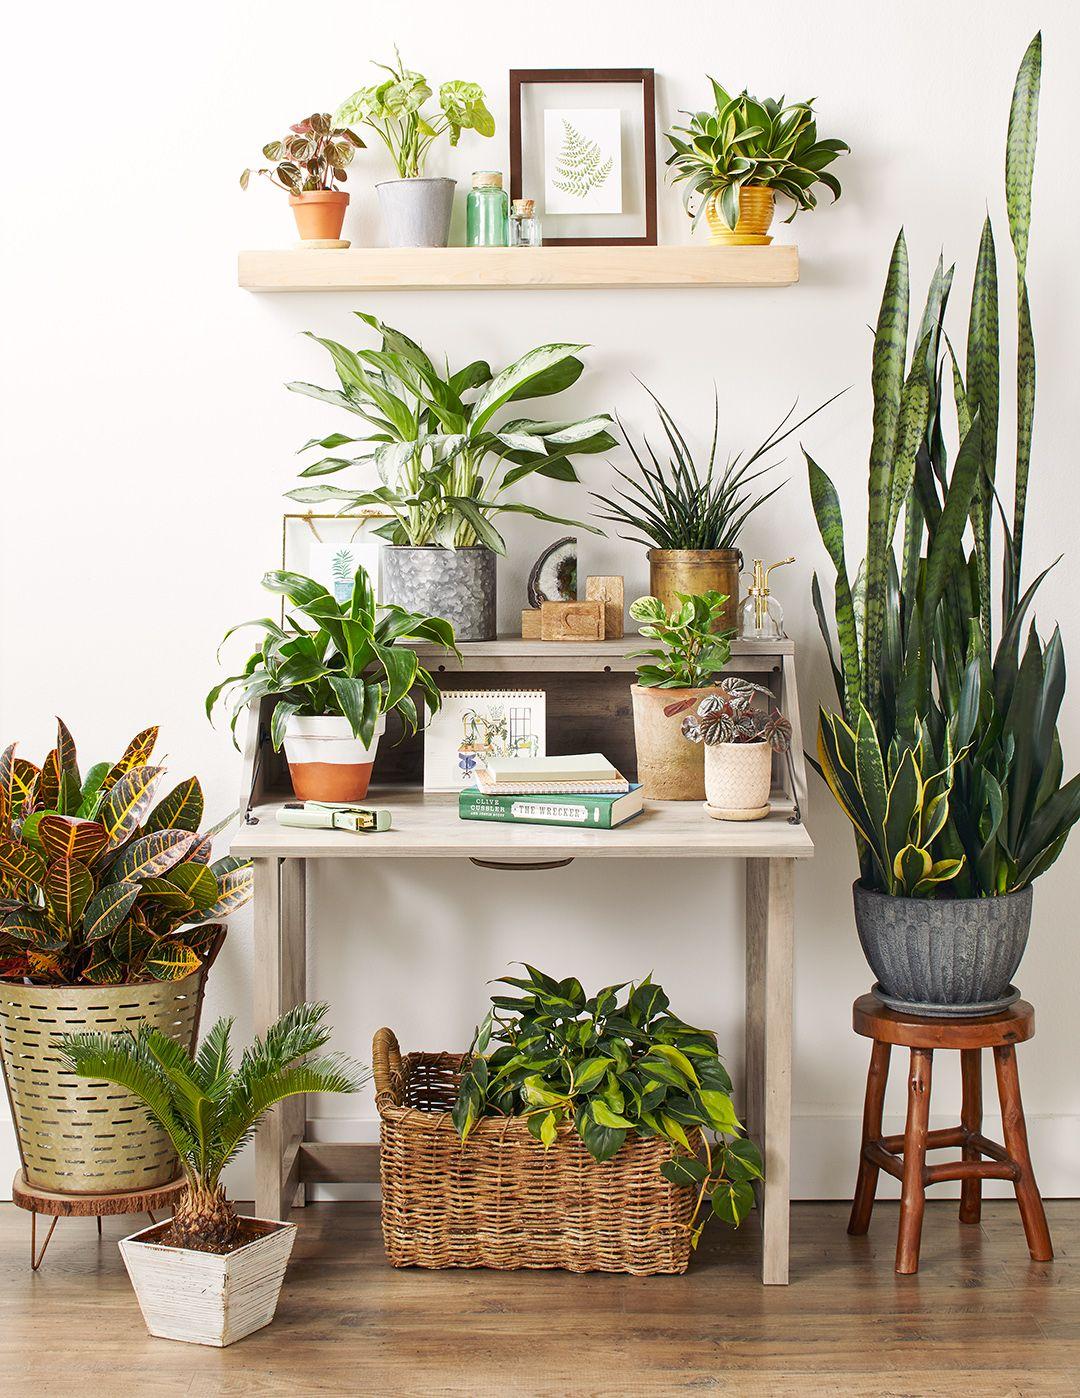 2f1ba25e44187cf200259e7082cd5490 - Better Homes And Gardens Potted Plants Ideas